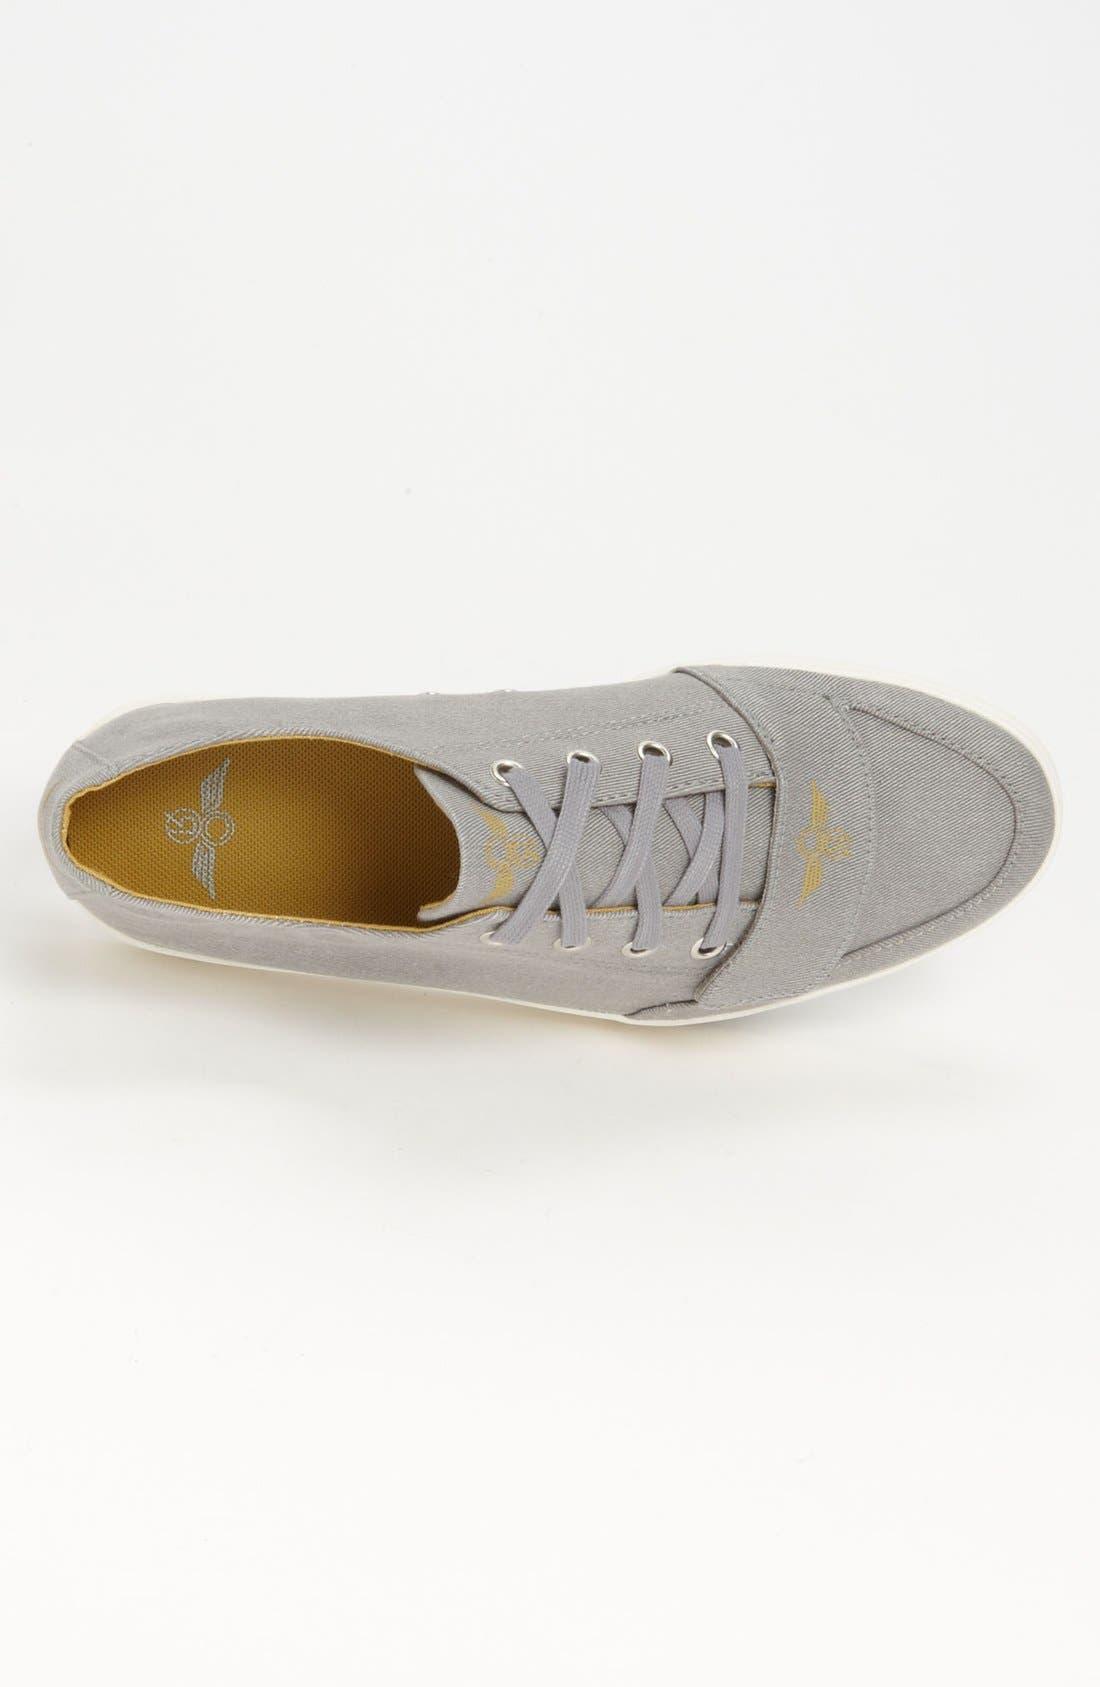 Alternate Image 3  - Creative Recreation 'Ciro Lo' Sneaker (Men)